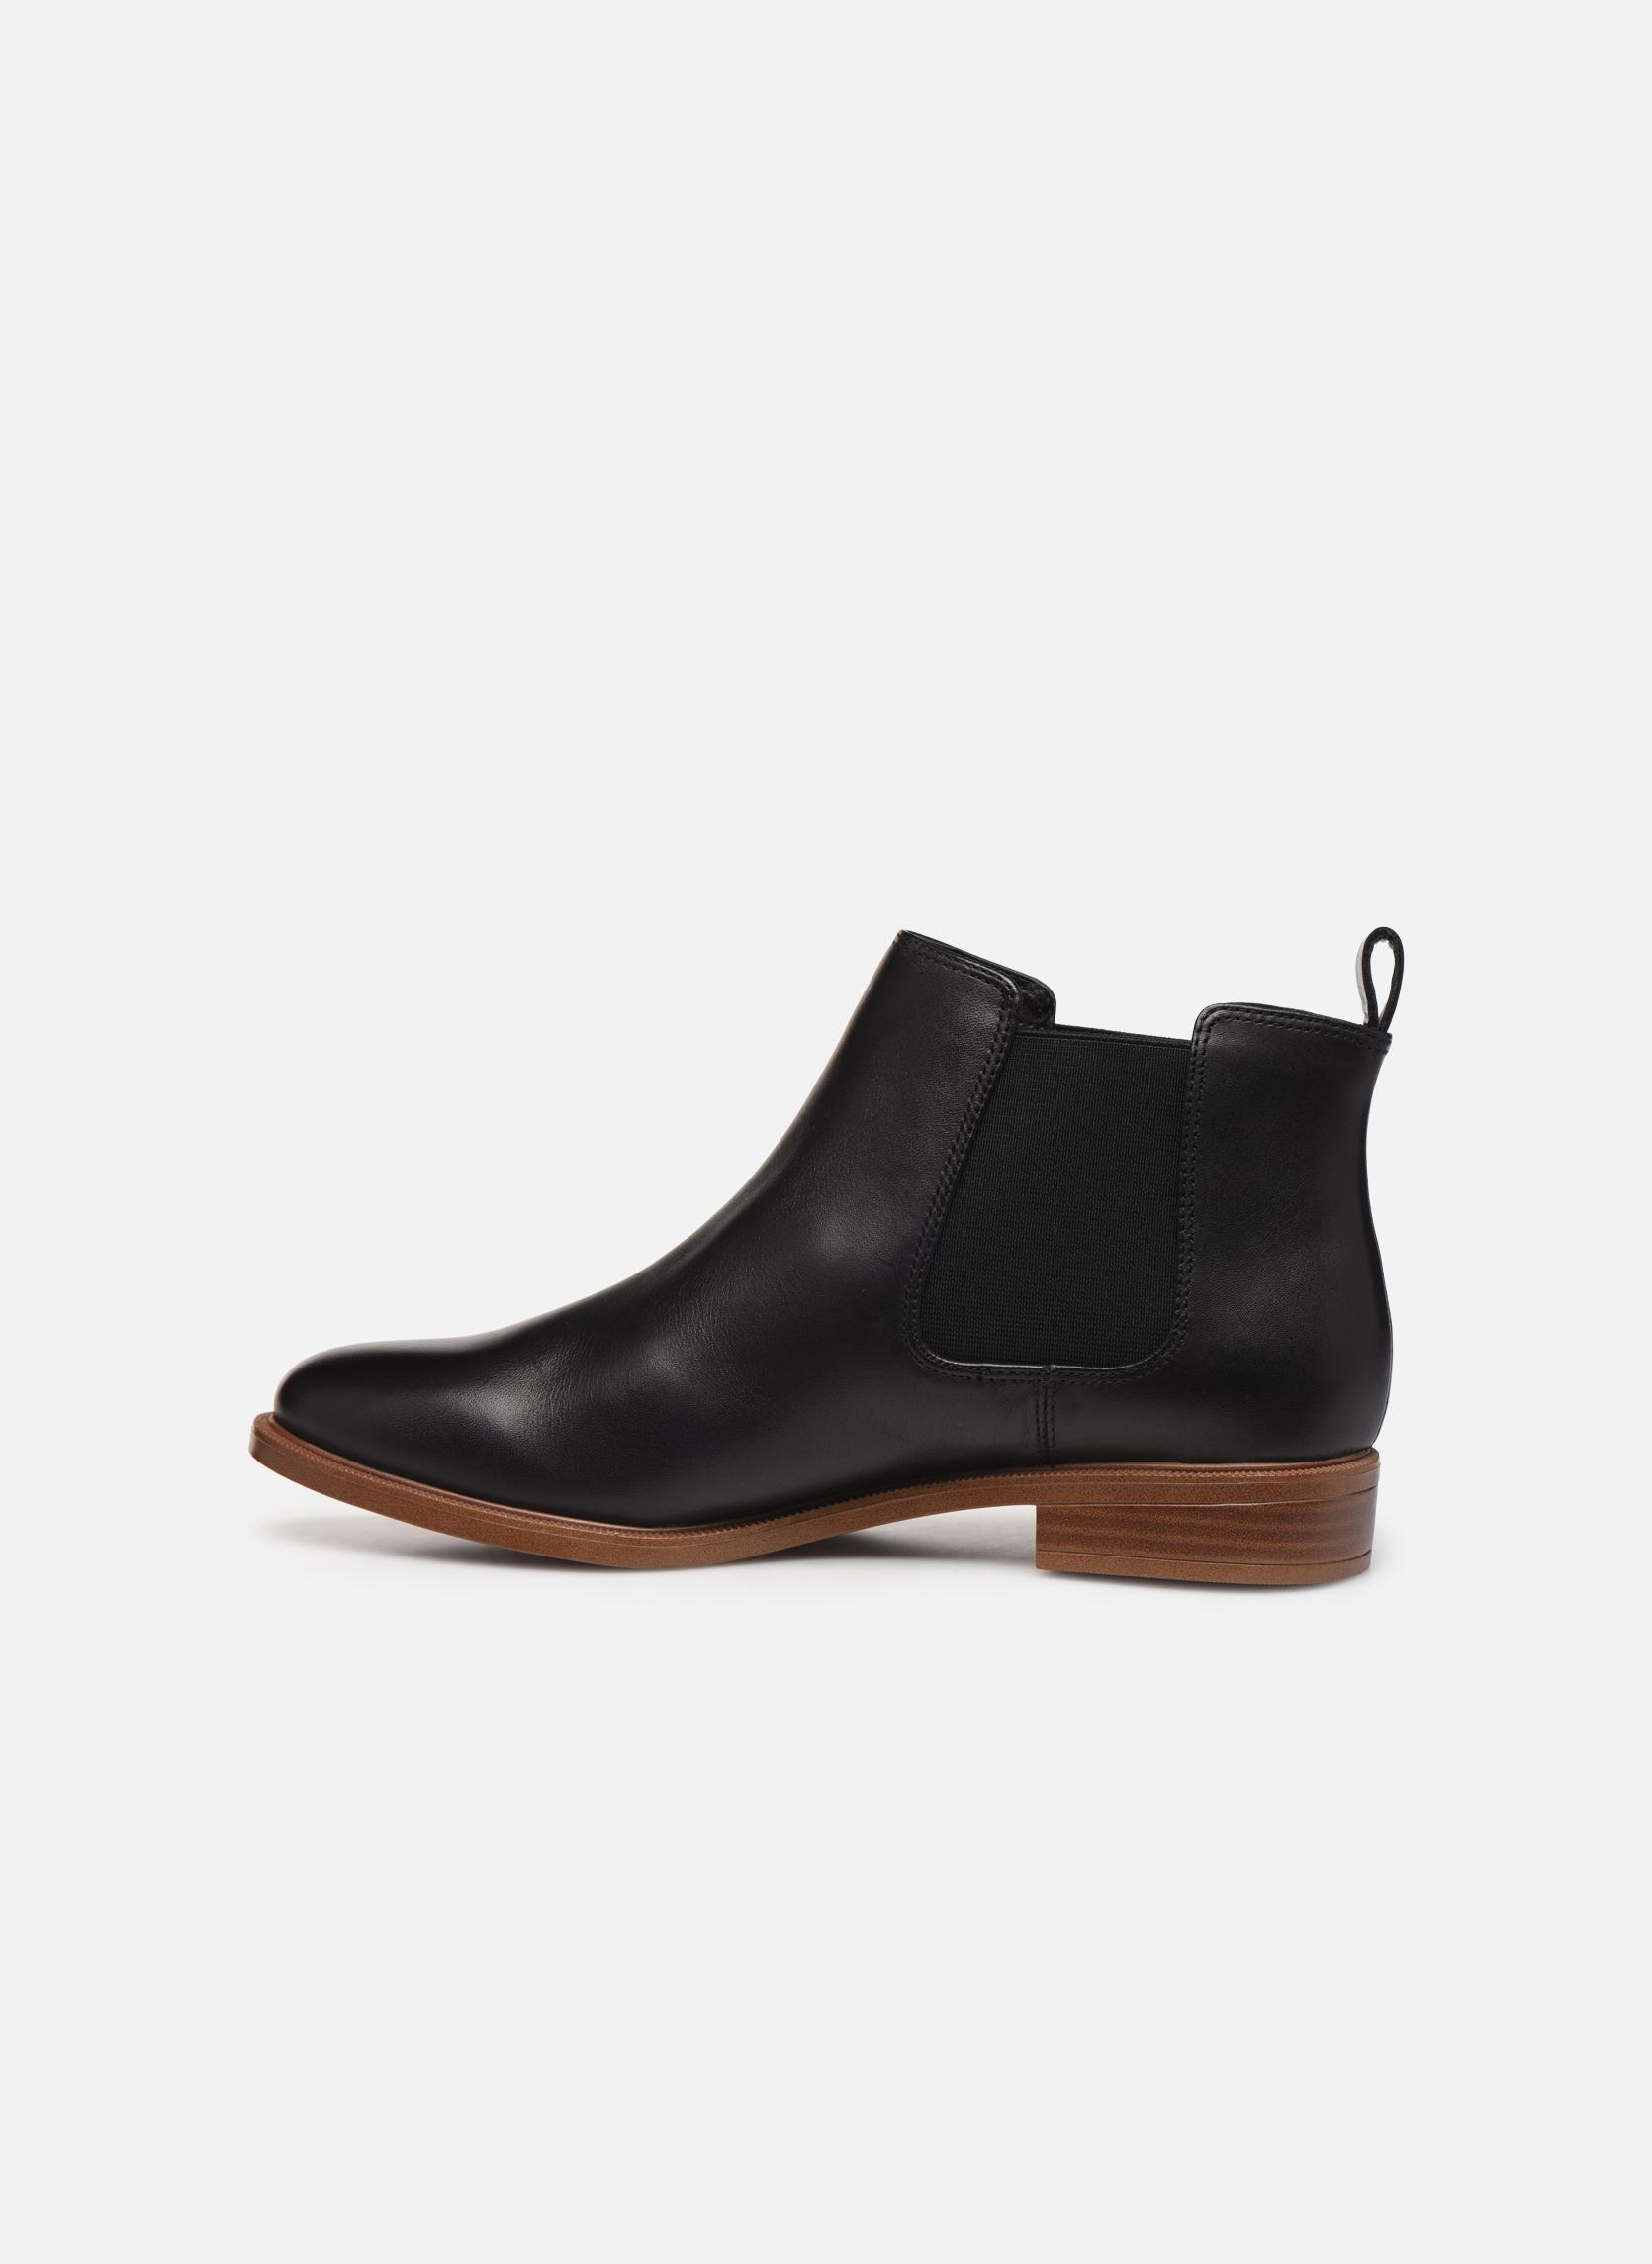 Taylor Shine Black leather